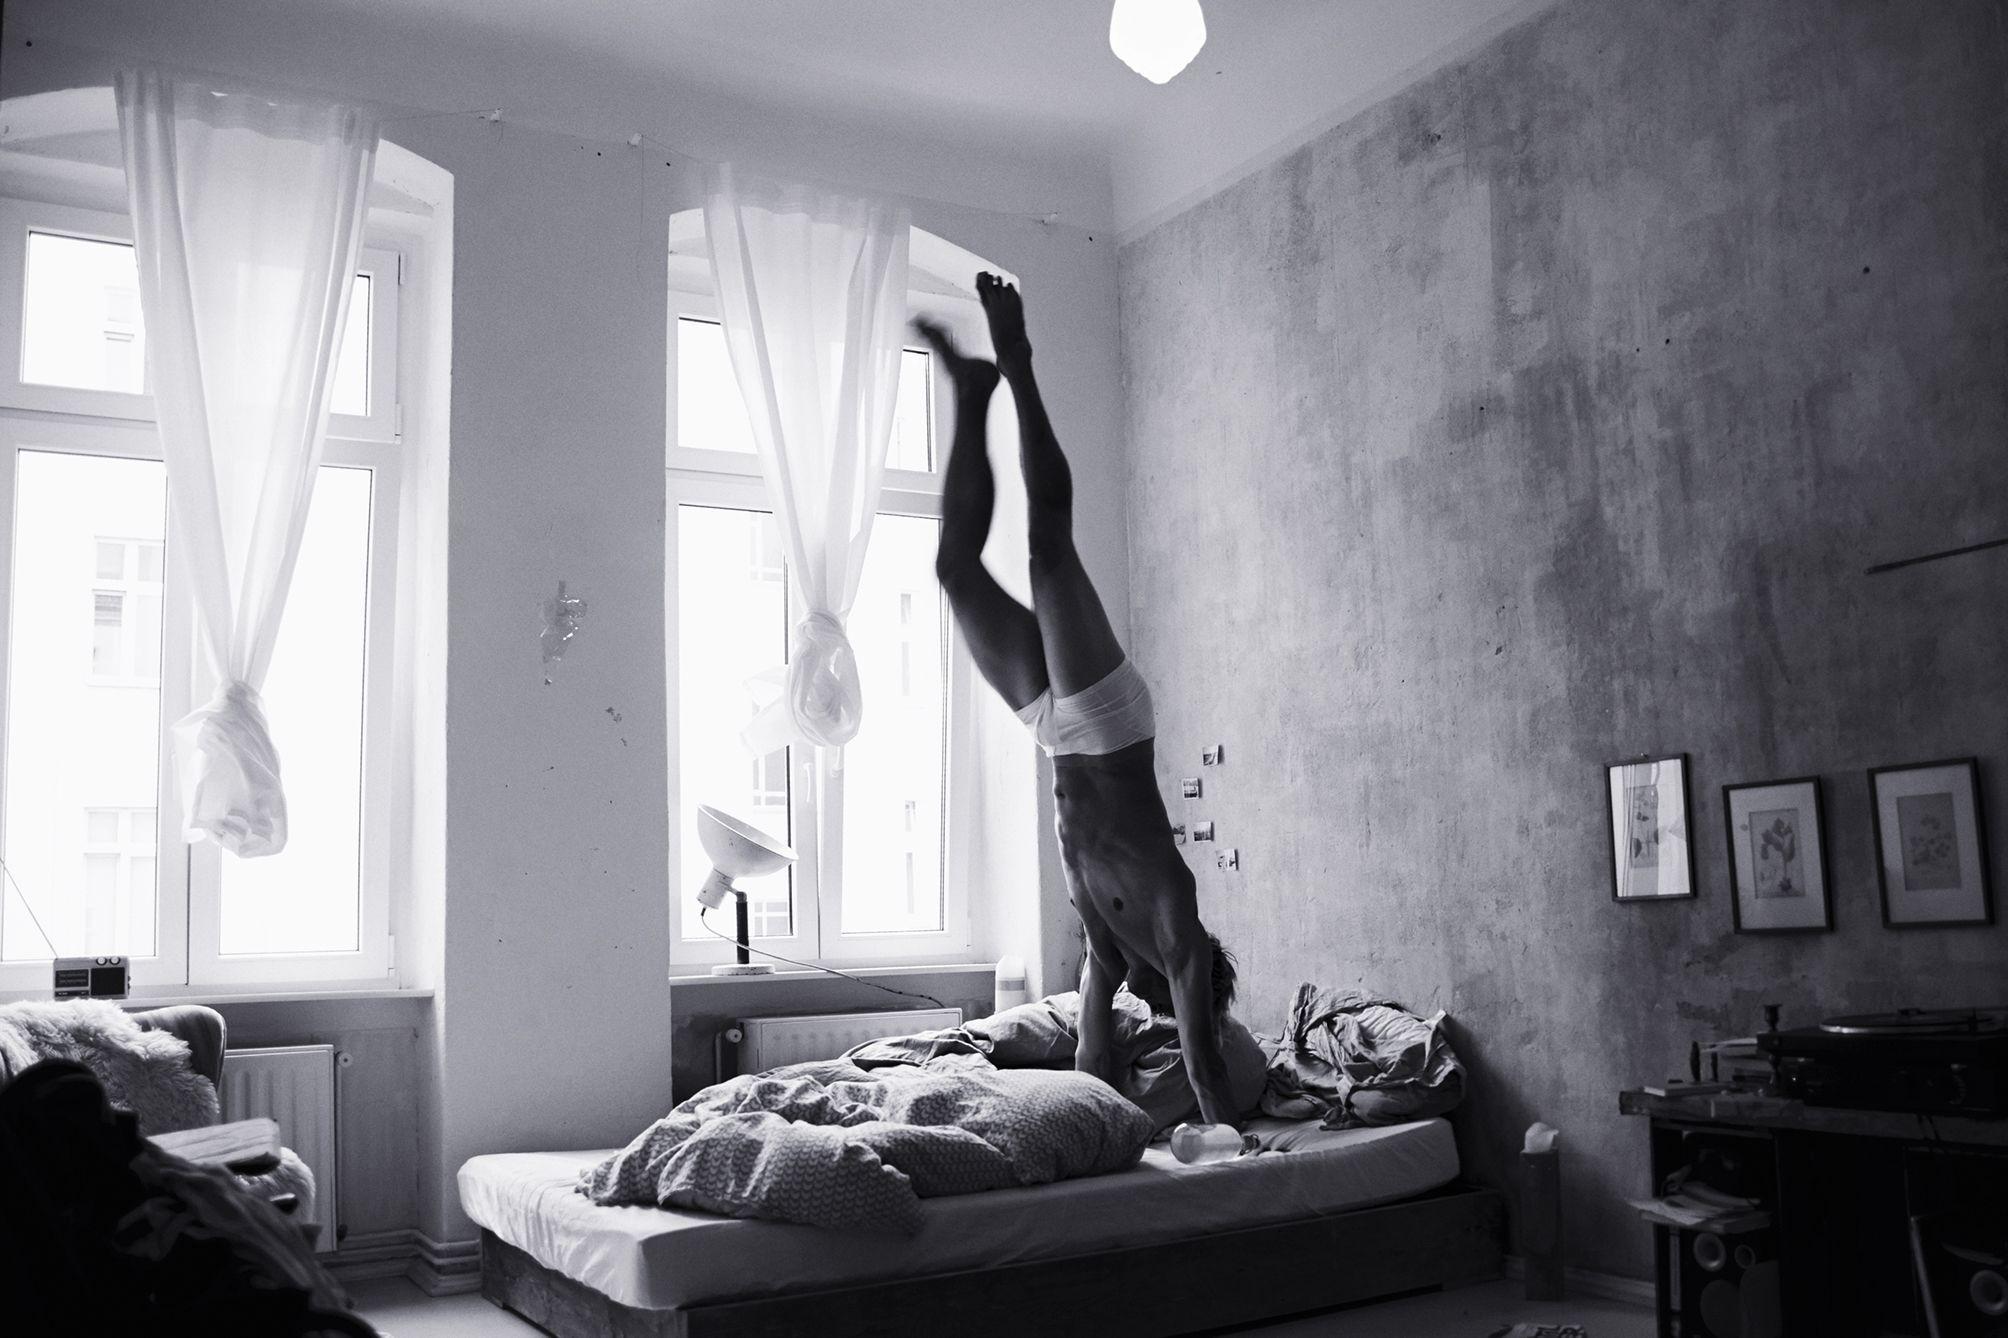 Portrait of an athlete doing handstands in his bed in Berlin